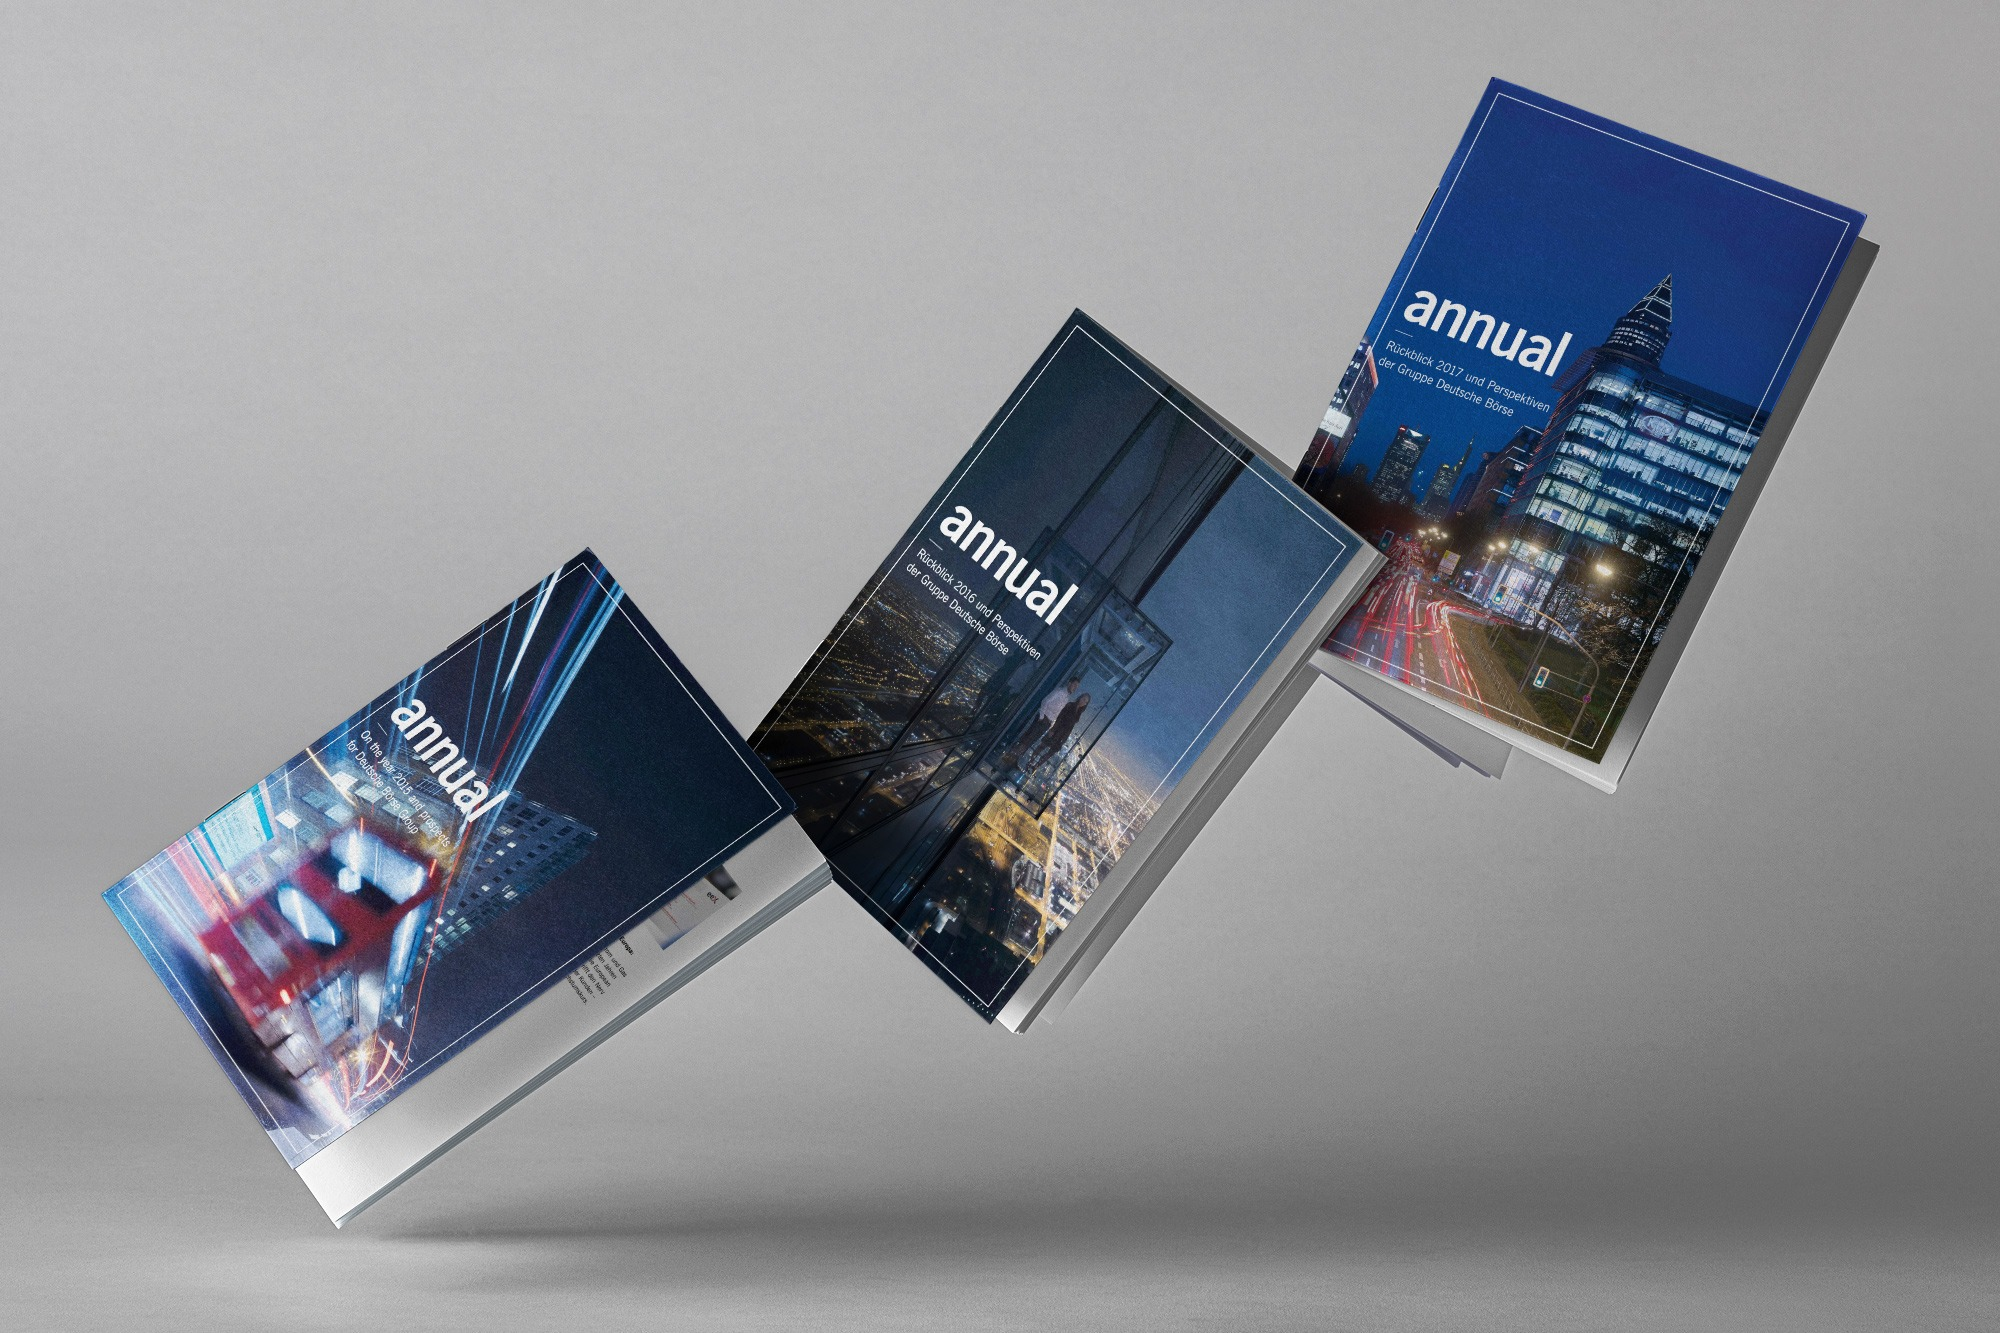 Studio dos, Grafikdesign Osnabrück, Gruppe Deutsche Börse Annual Cover